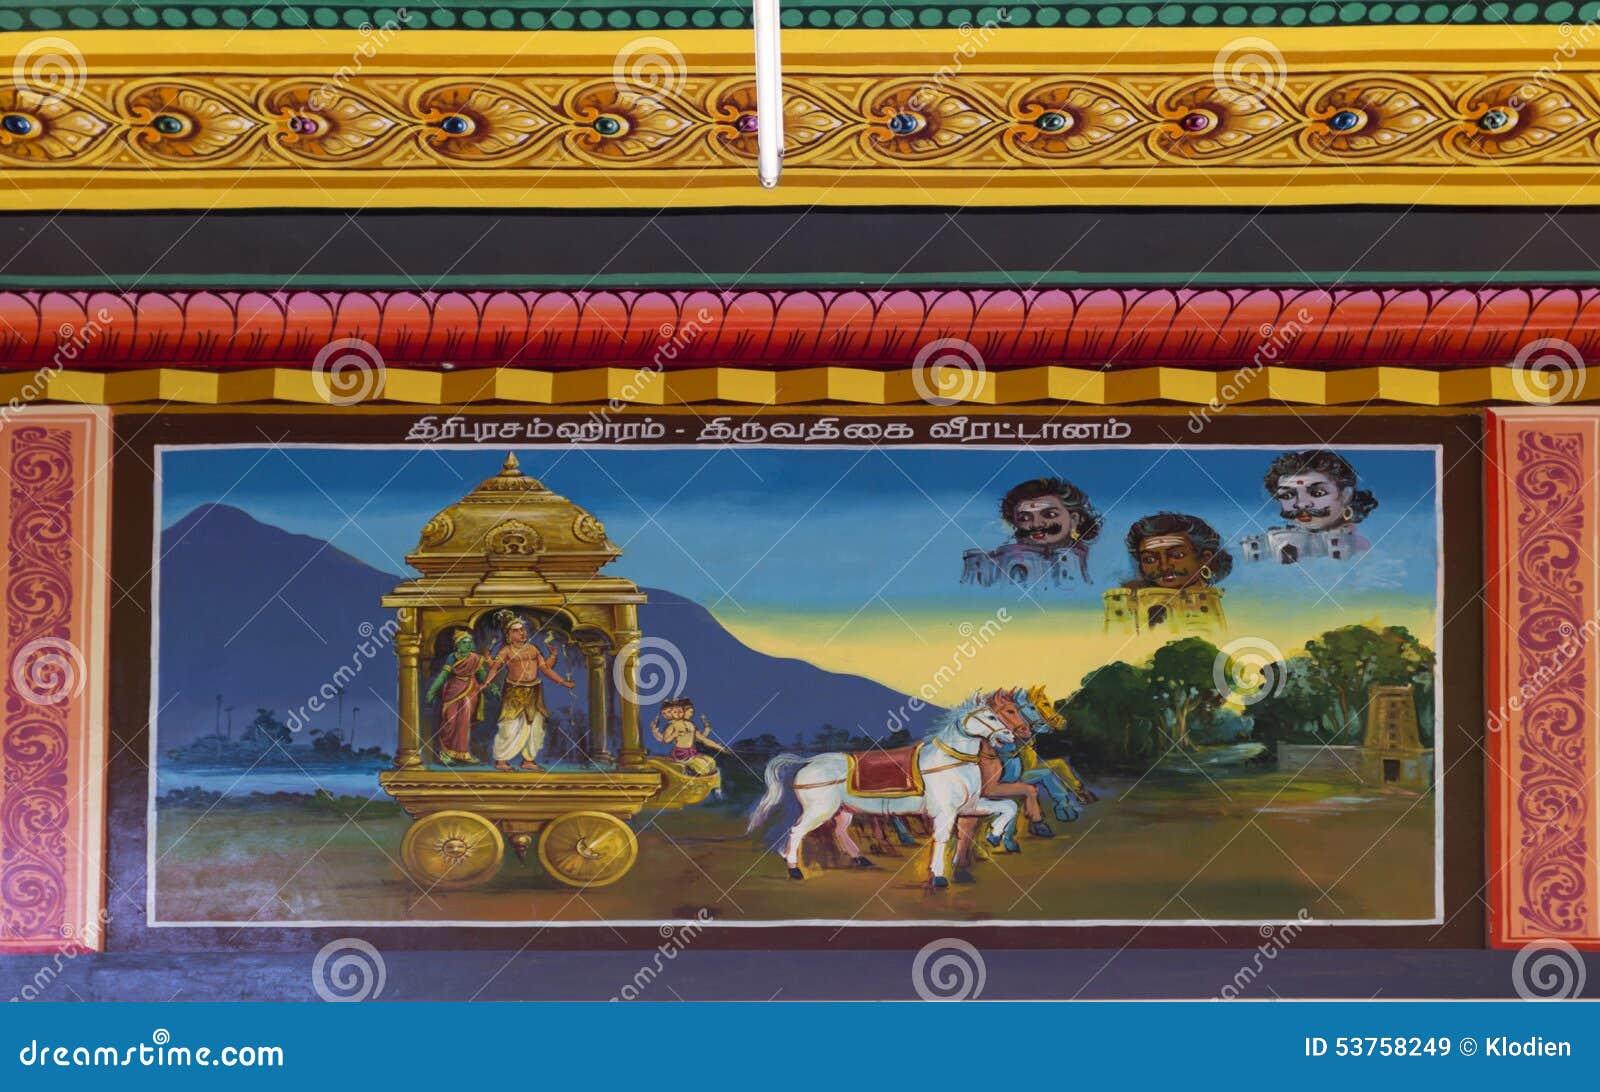 Pintura da legenda do templo de Thriuvathigai